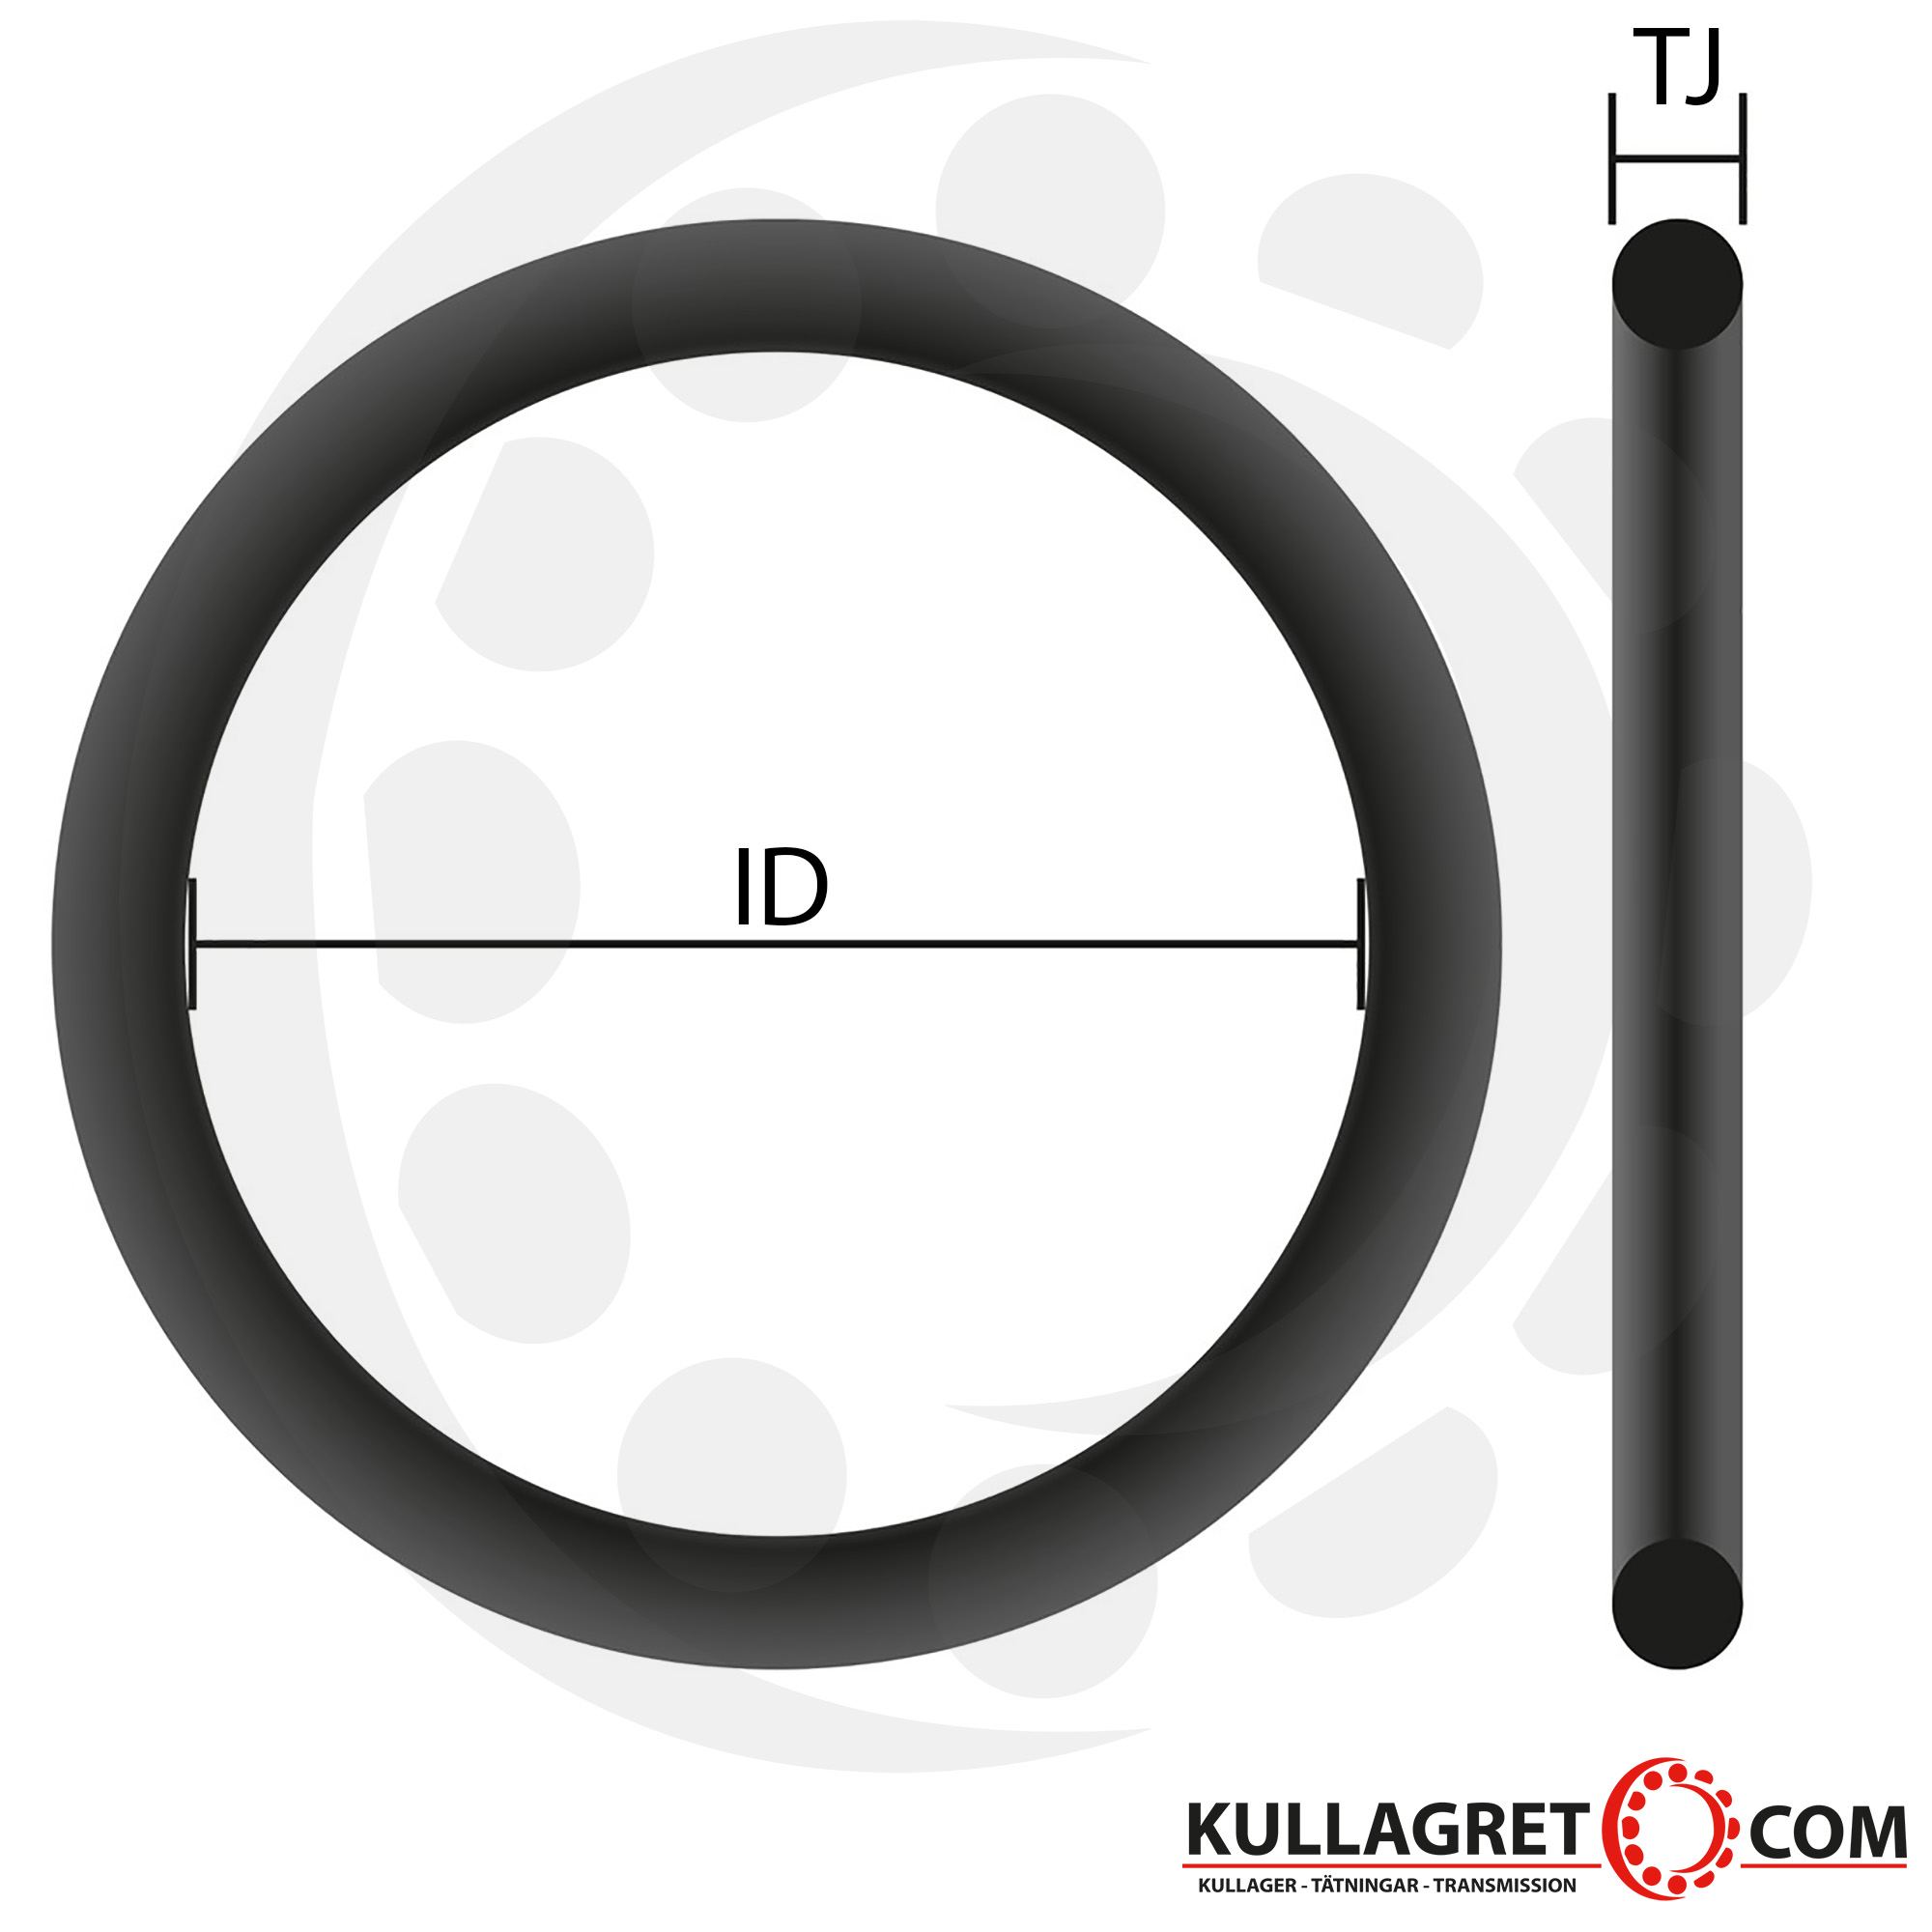 2 St. O-Ring Nullring Rundring 88,0 x 5,0 mm NBR 70 Shore A schwarz